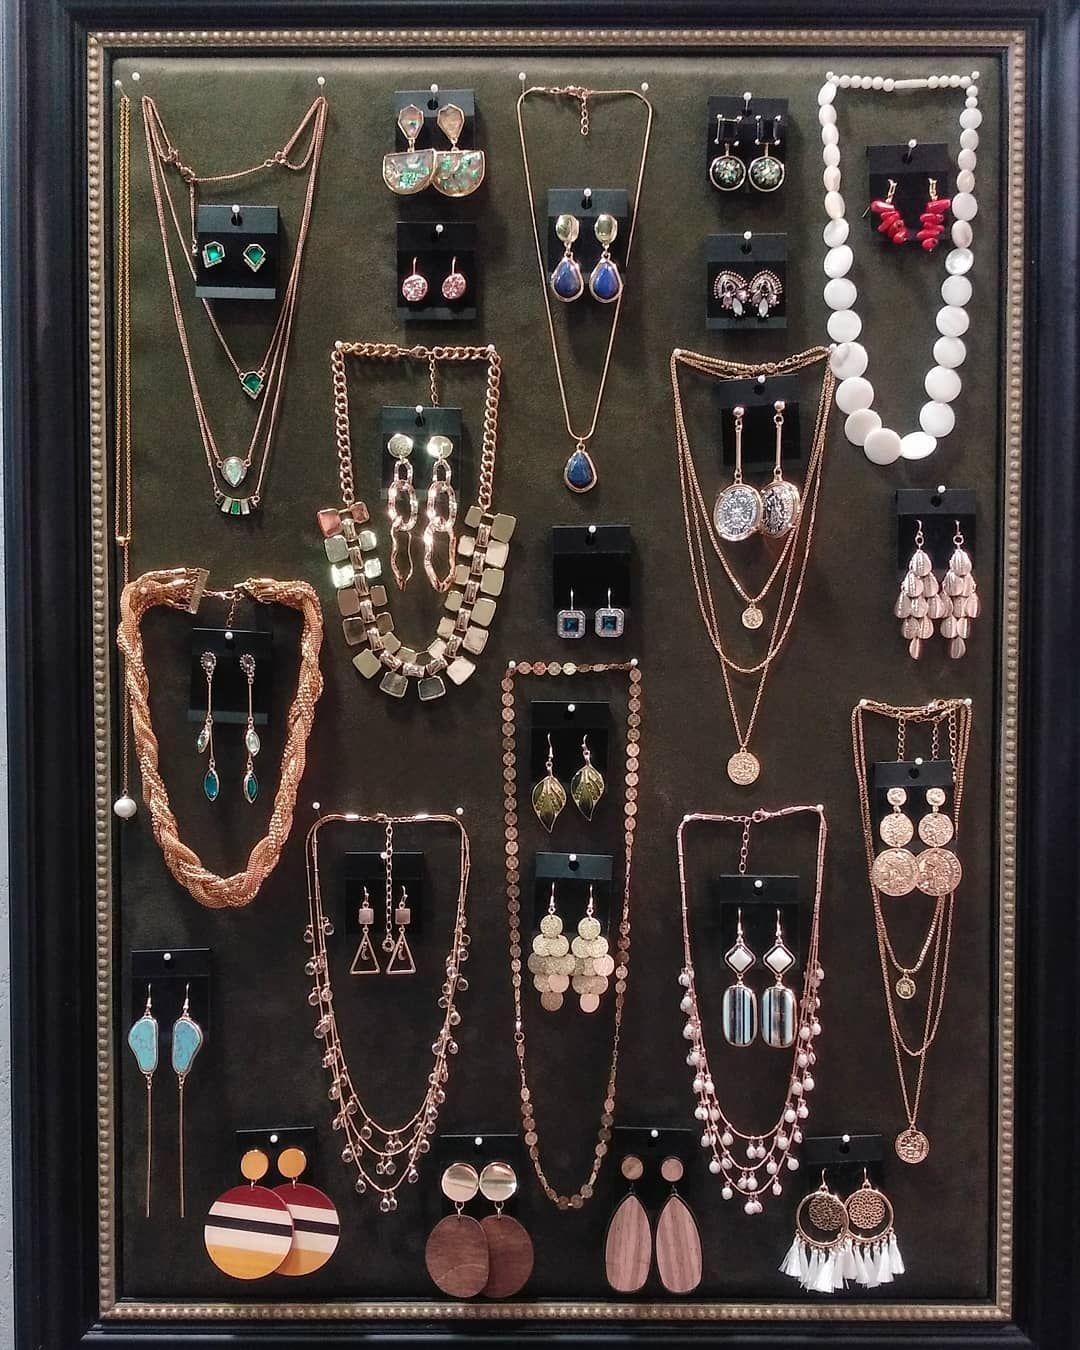 [New] The 10 Best Home Decor (with Pictures) -  ВСЕ ПО 500 руб! #женскаяодежда #женскаяобувь #аксессуары #весенняяколлекция #бижутерия #украшения #бижу #серьги #колье #бохо #бохостиль #модно #стильно #необычно #СПб #SOLBoutique #solboutiqueclothing #new #shopping #womenfashion #fashion #style #stylish #cute #girls #girly #bijou #accessories #SPb #instafashion